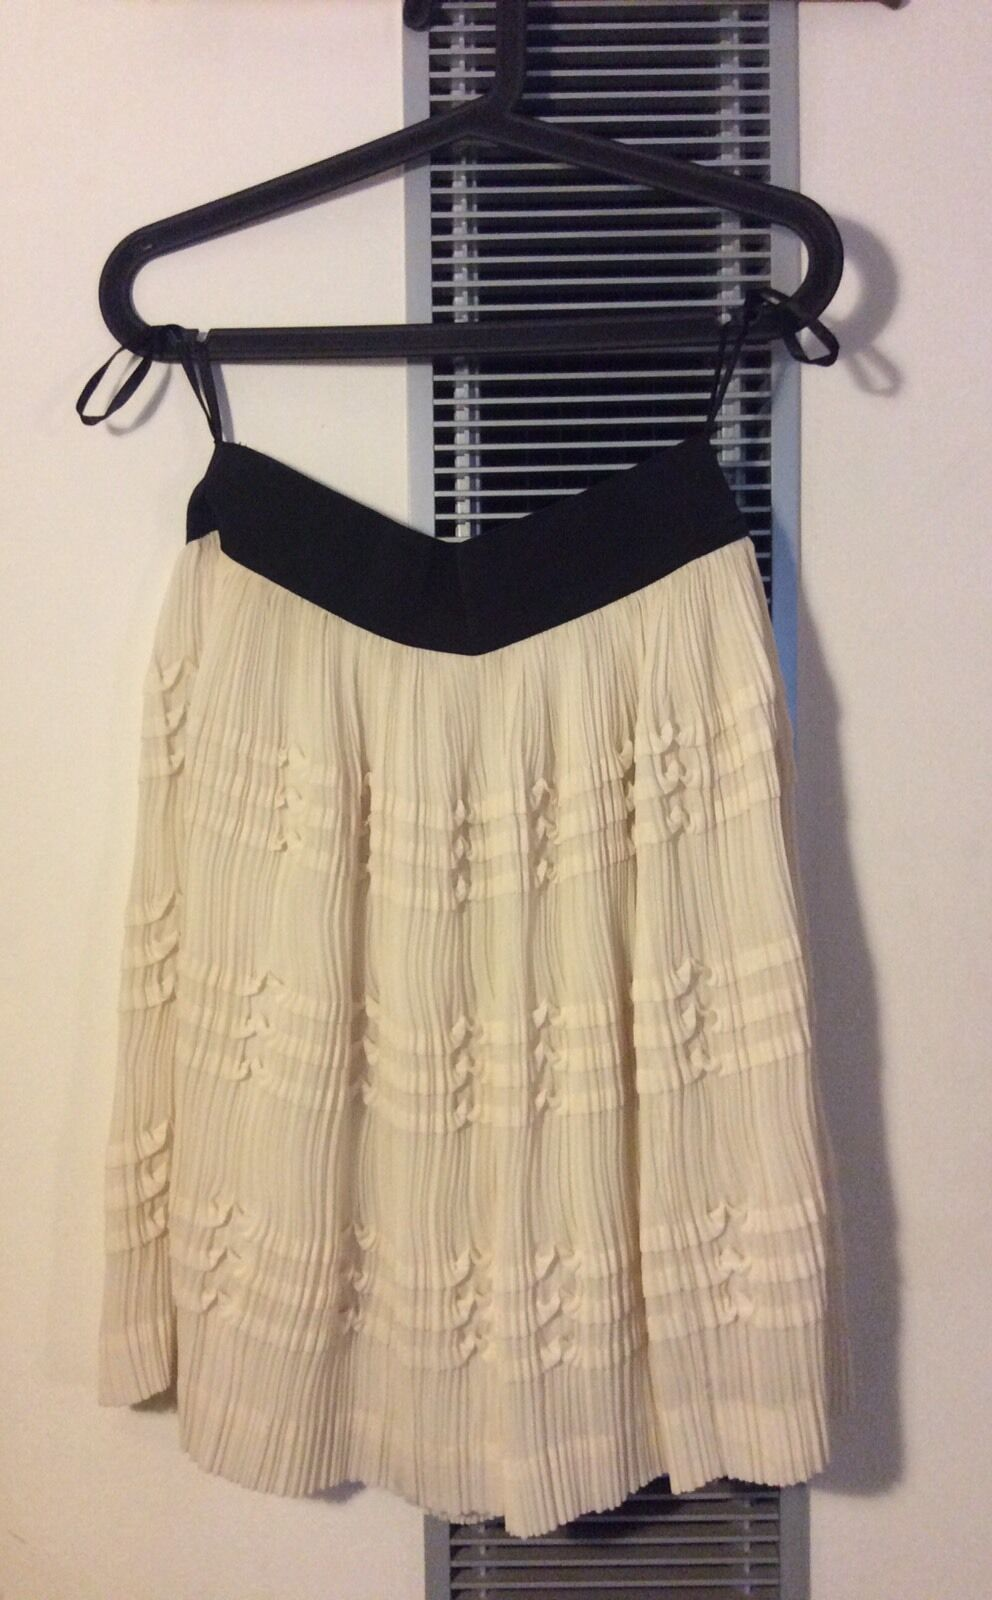 REISS Pleated Summer Skirt - SIZE 10 (BRND NEW)